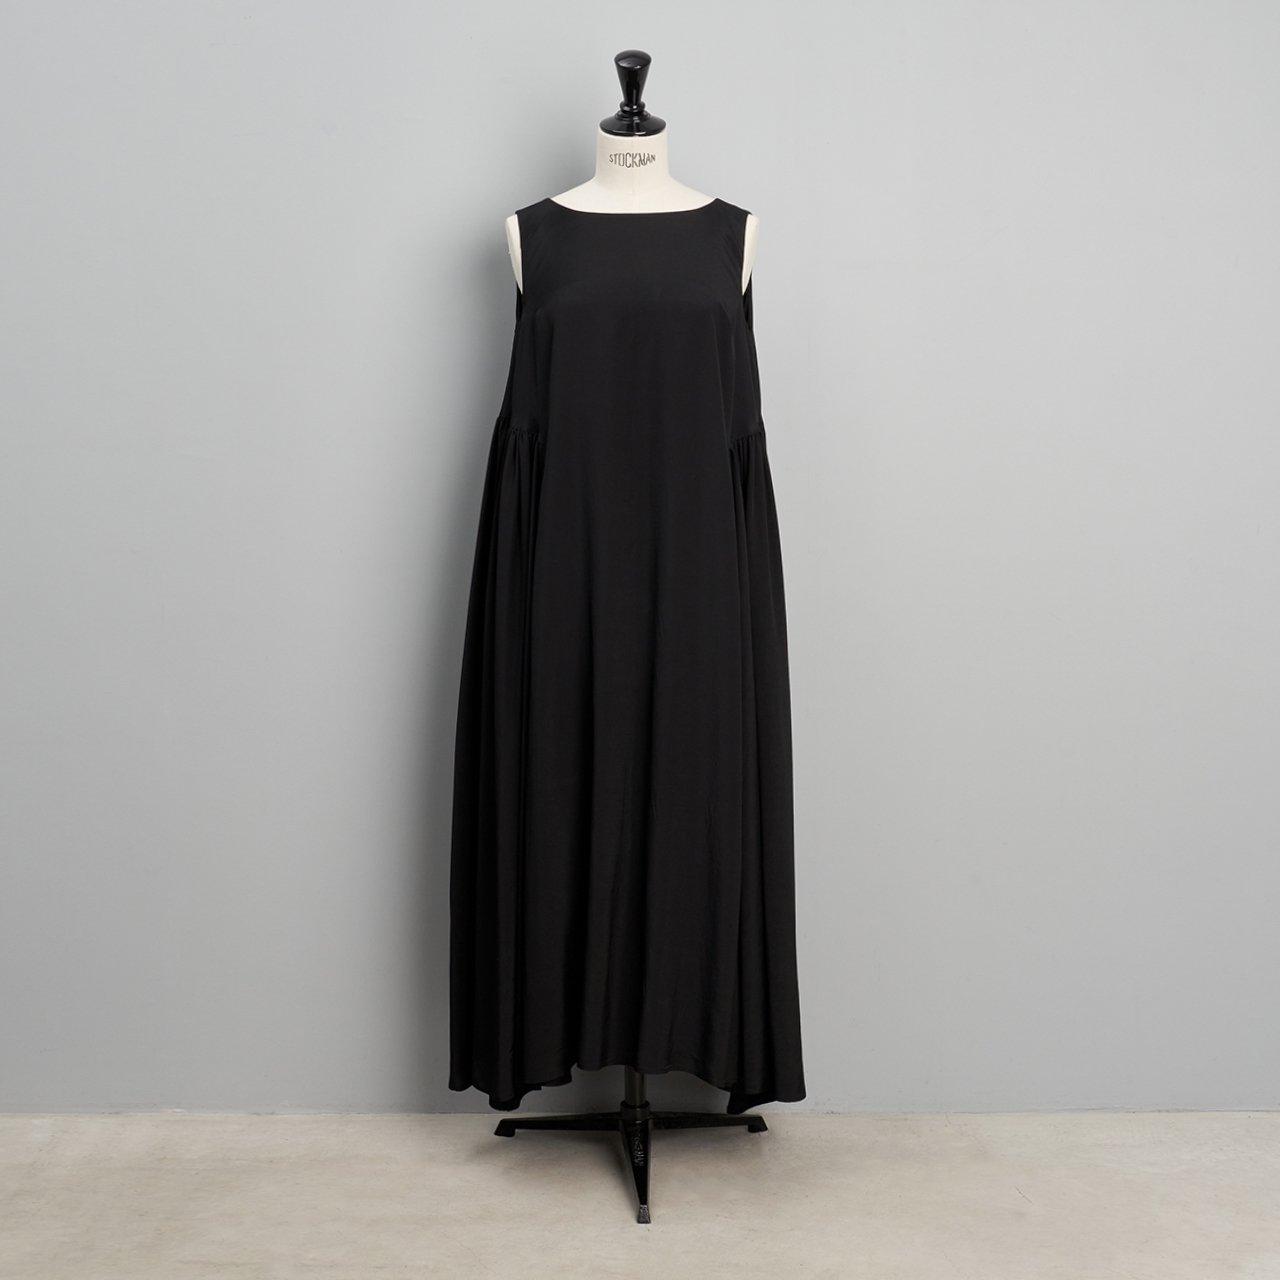 suzuki takayuki<BR>Sleeveless dress<BR>Black